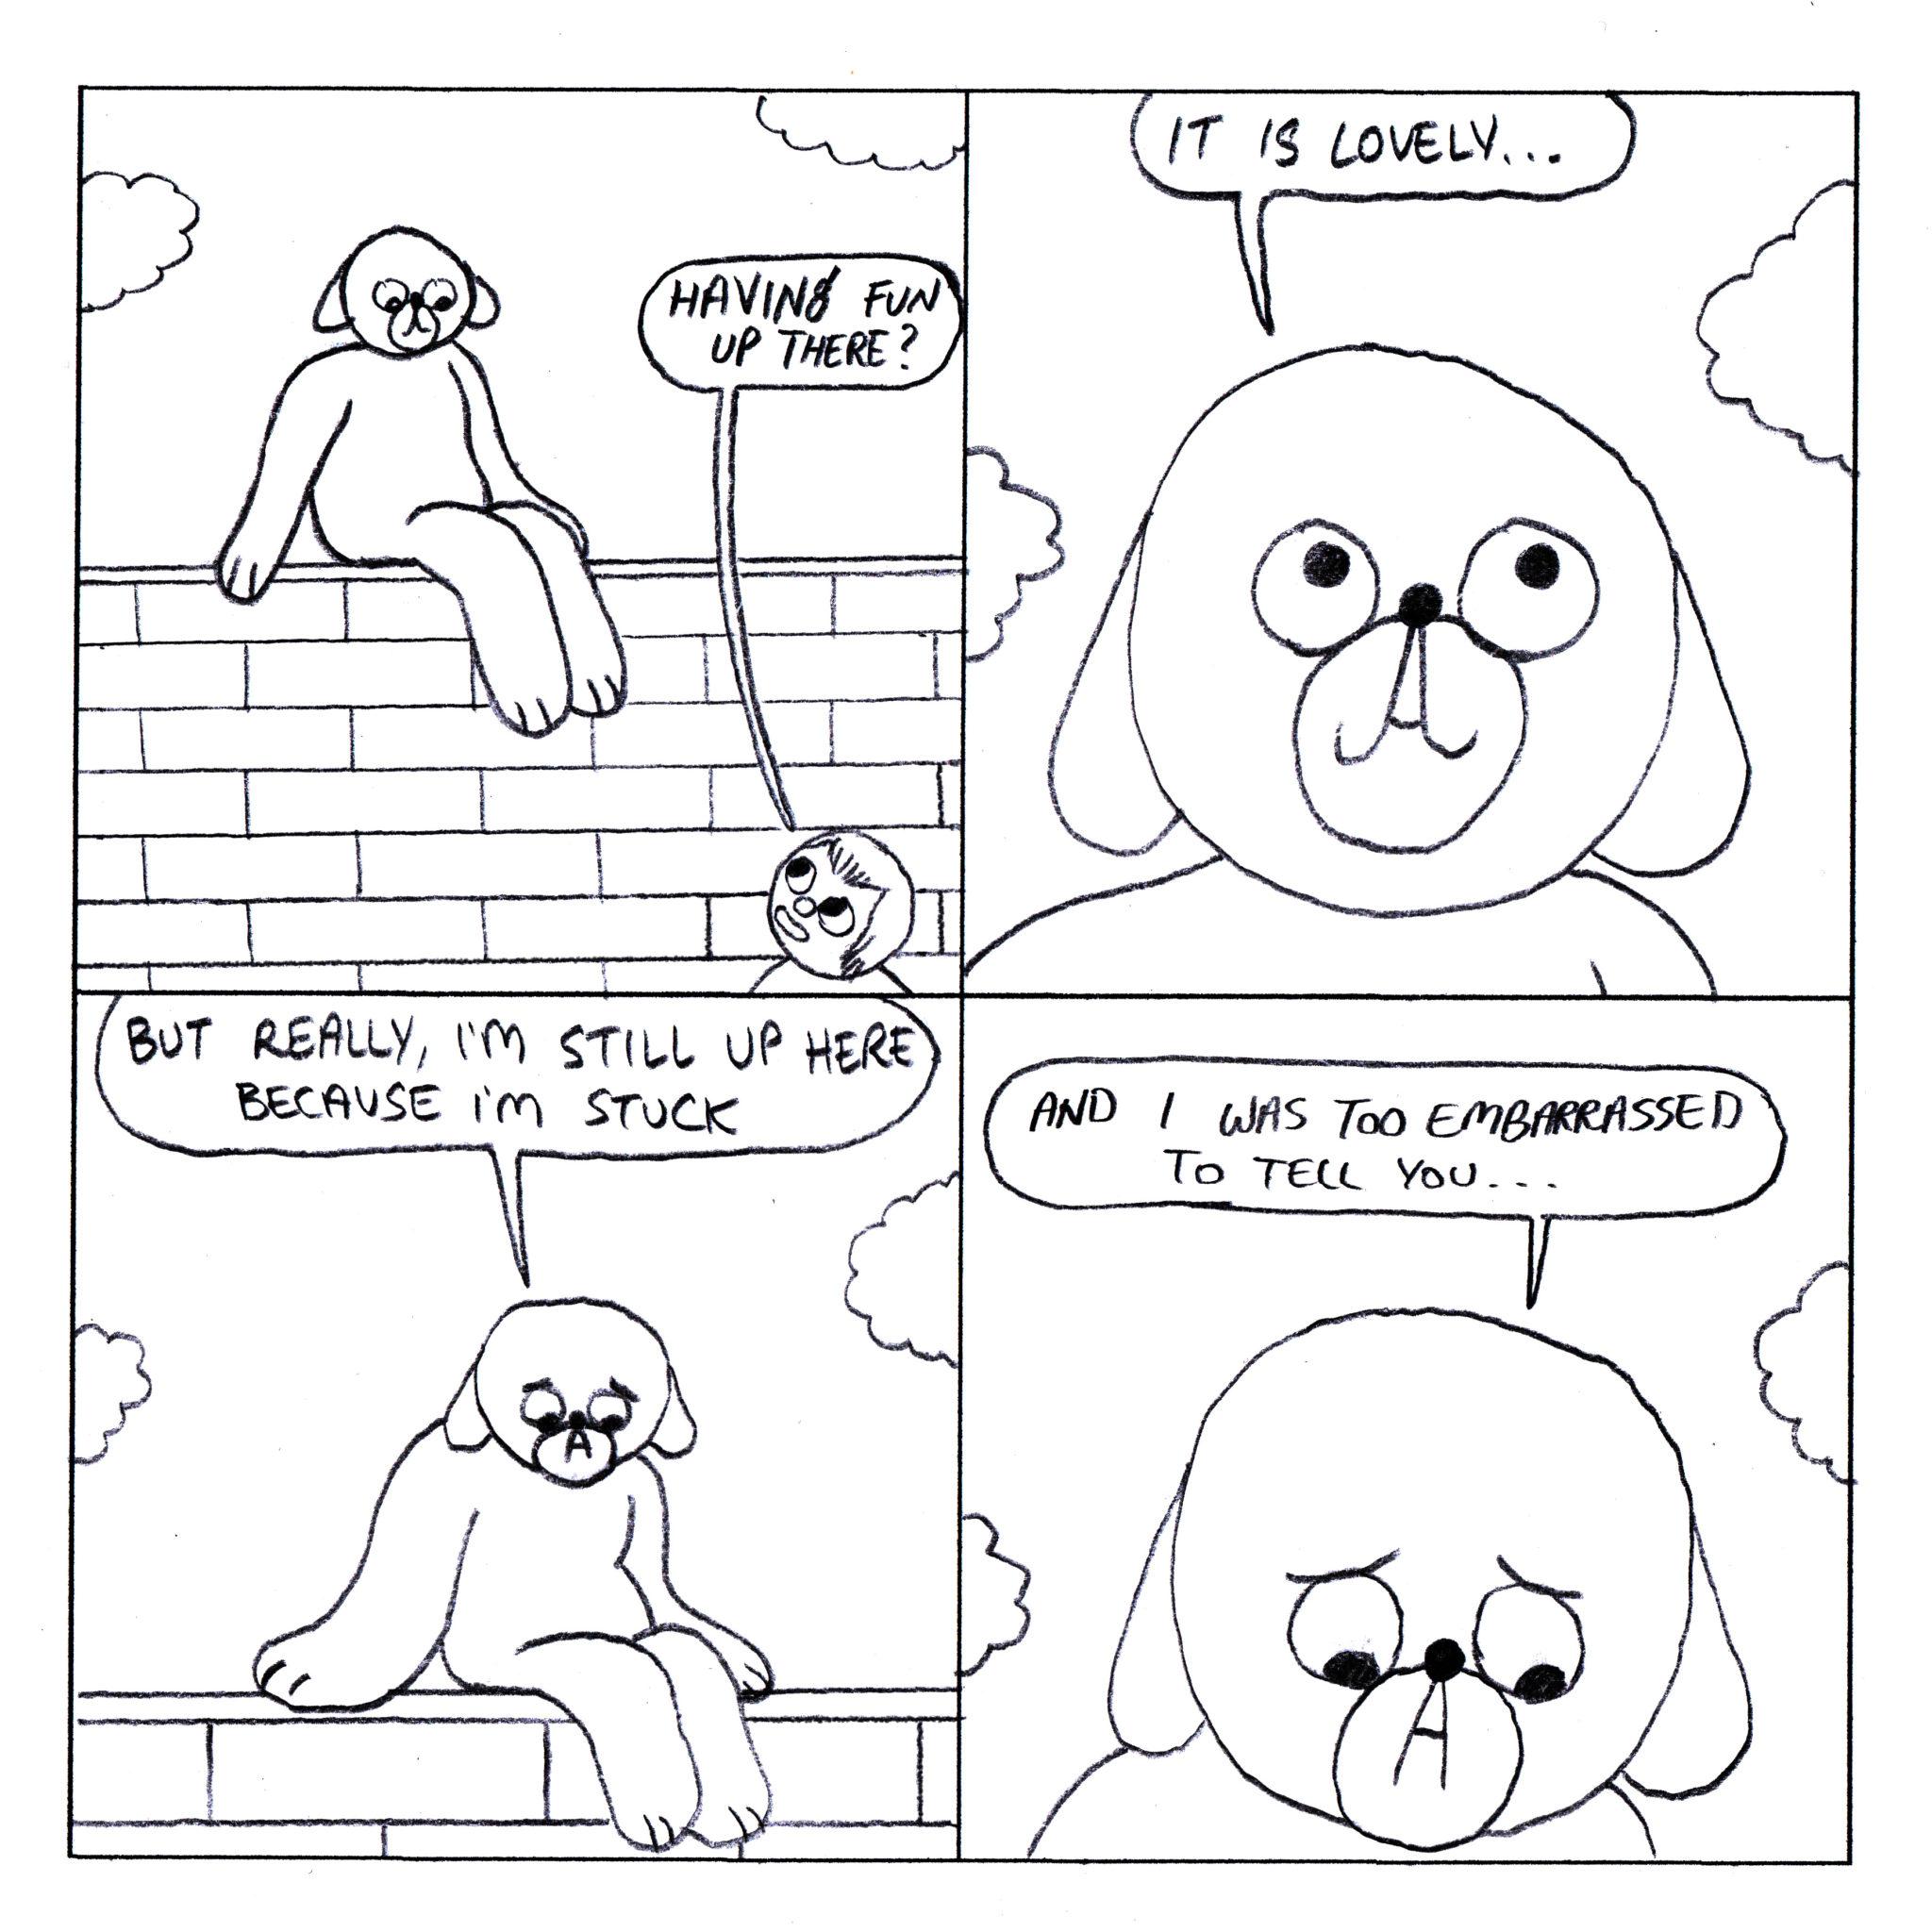 Dog Comics 166-170 - Page 1